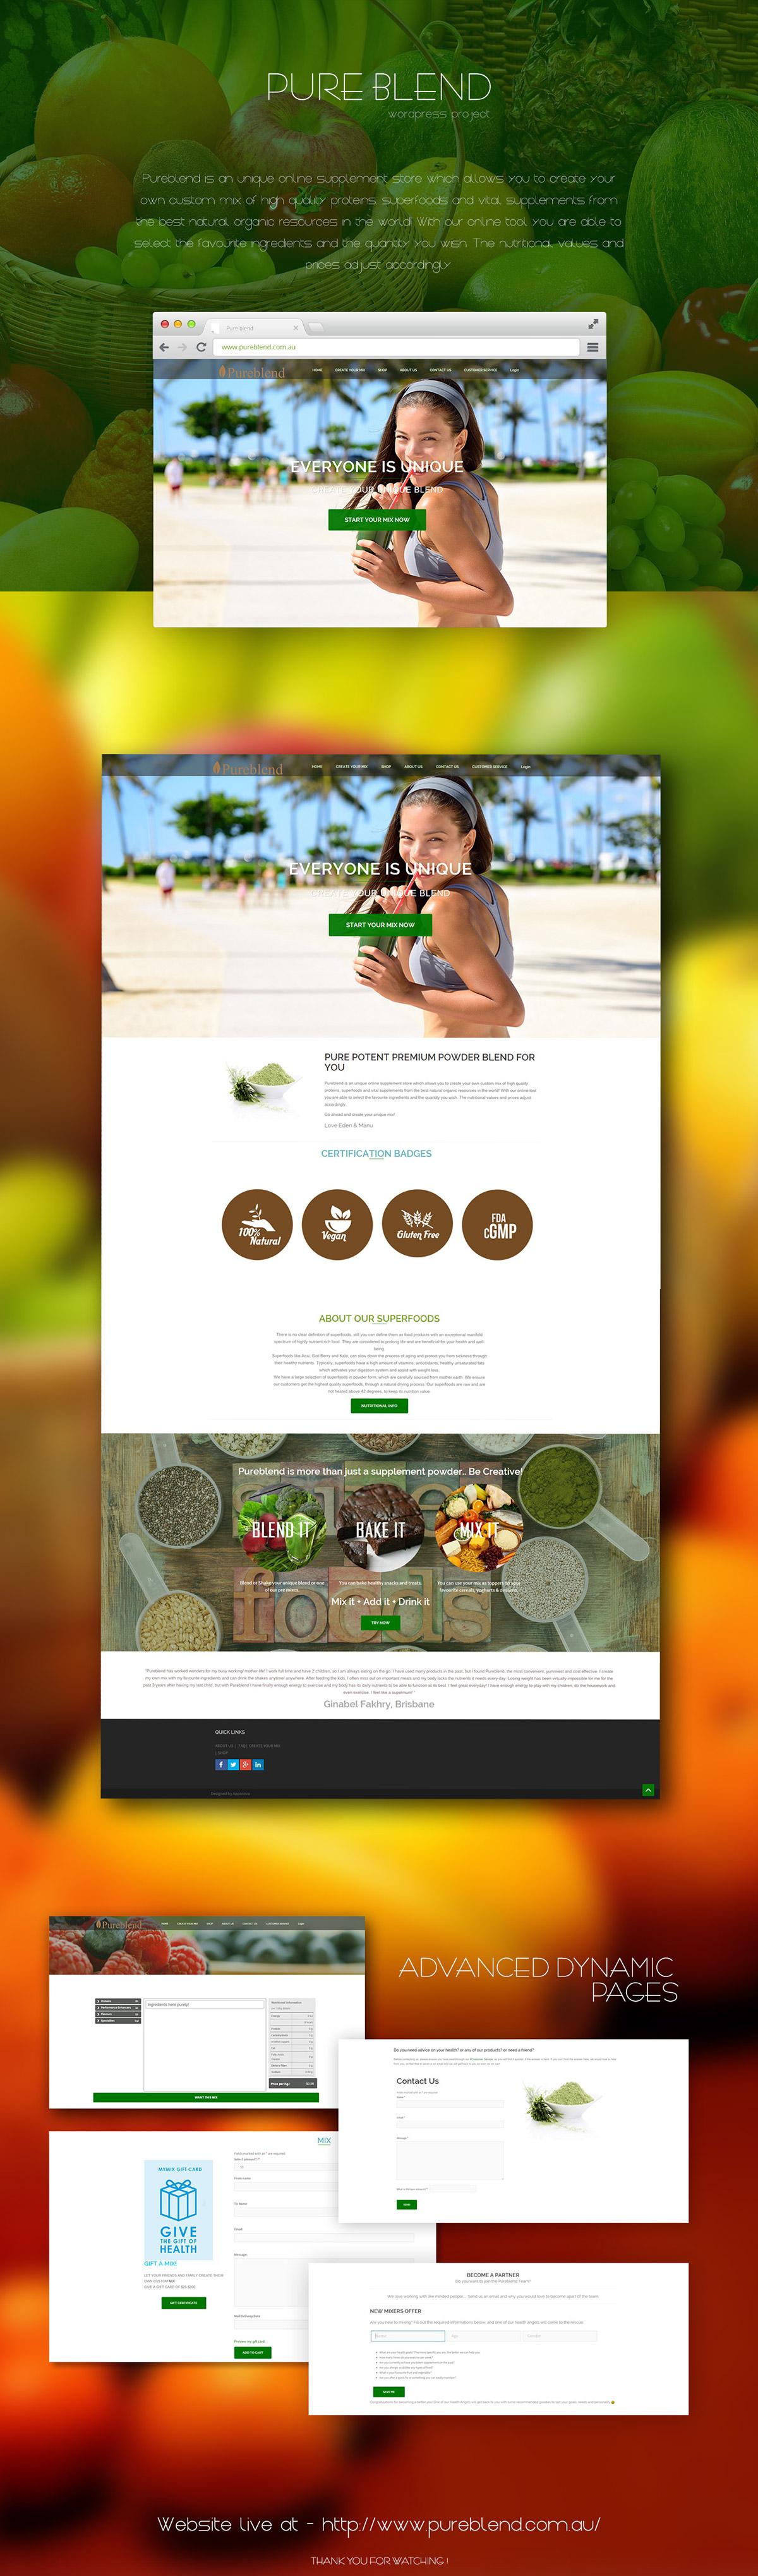 Pure Blend :wordpress website design